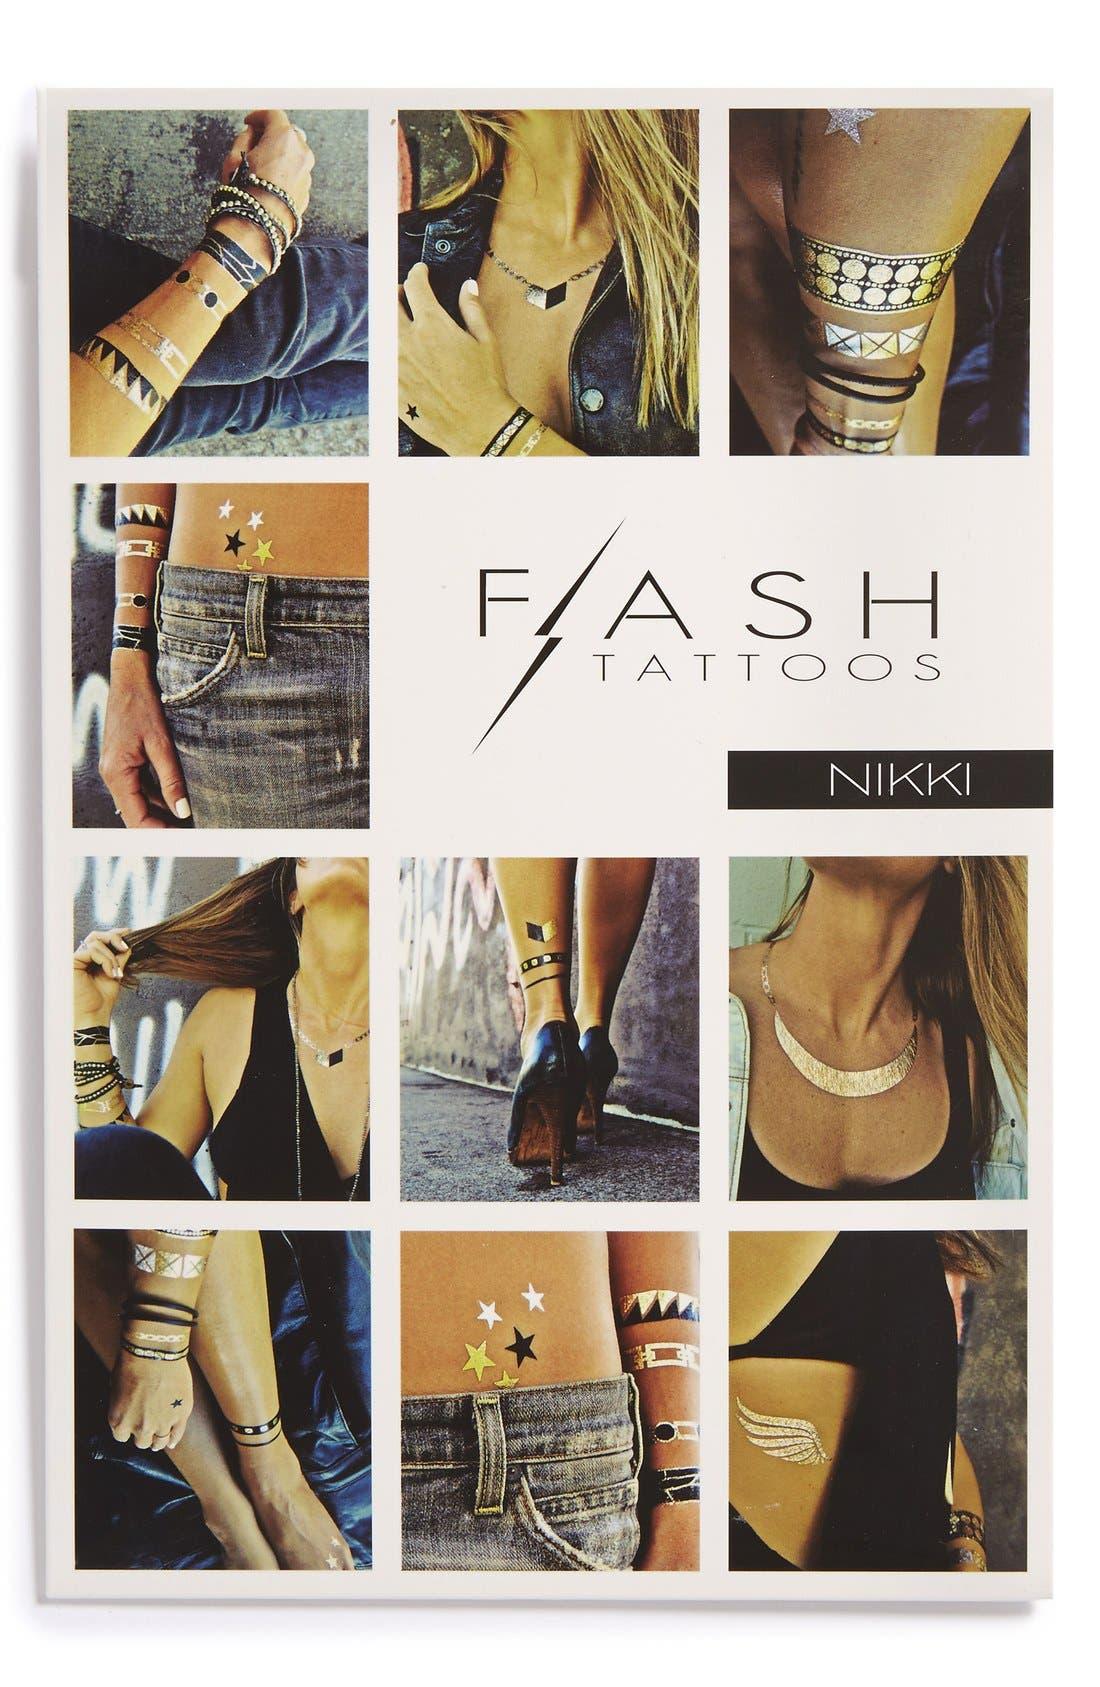 Alternate Image 1 Selected - Flash Tattoos 'Nikki' Temporary Tattoos (Juniors)